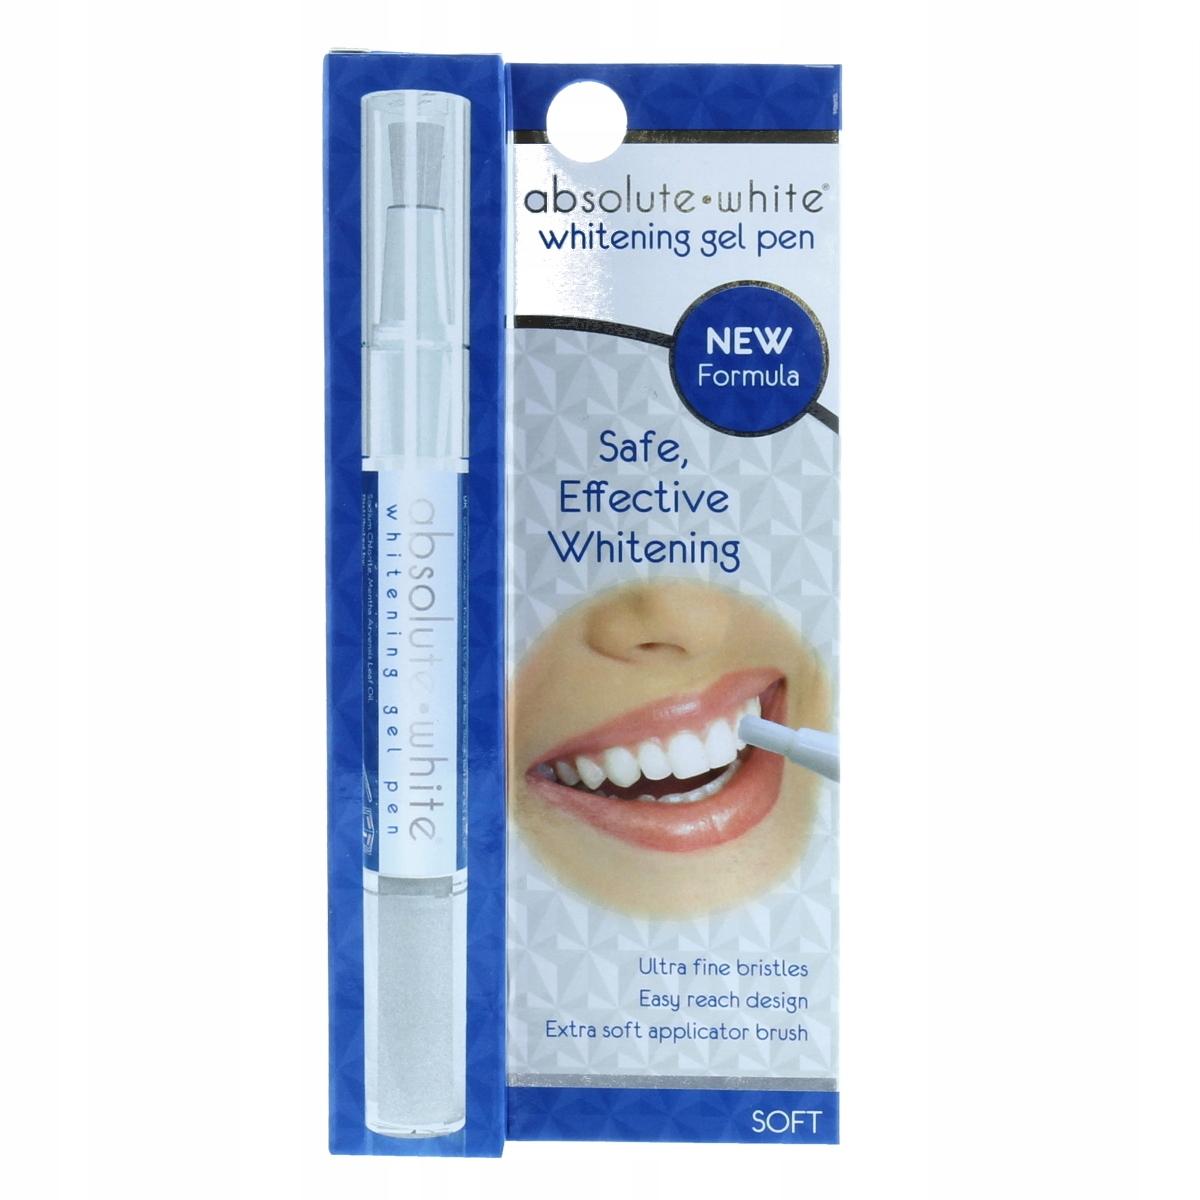 Absolute White Отбеливание зубов маркер для отбеливания зубов